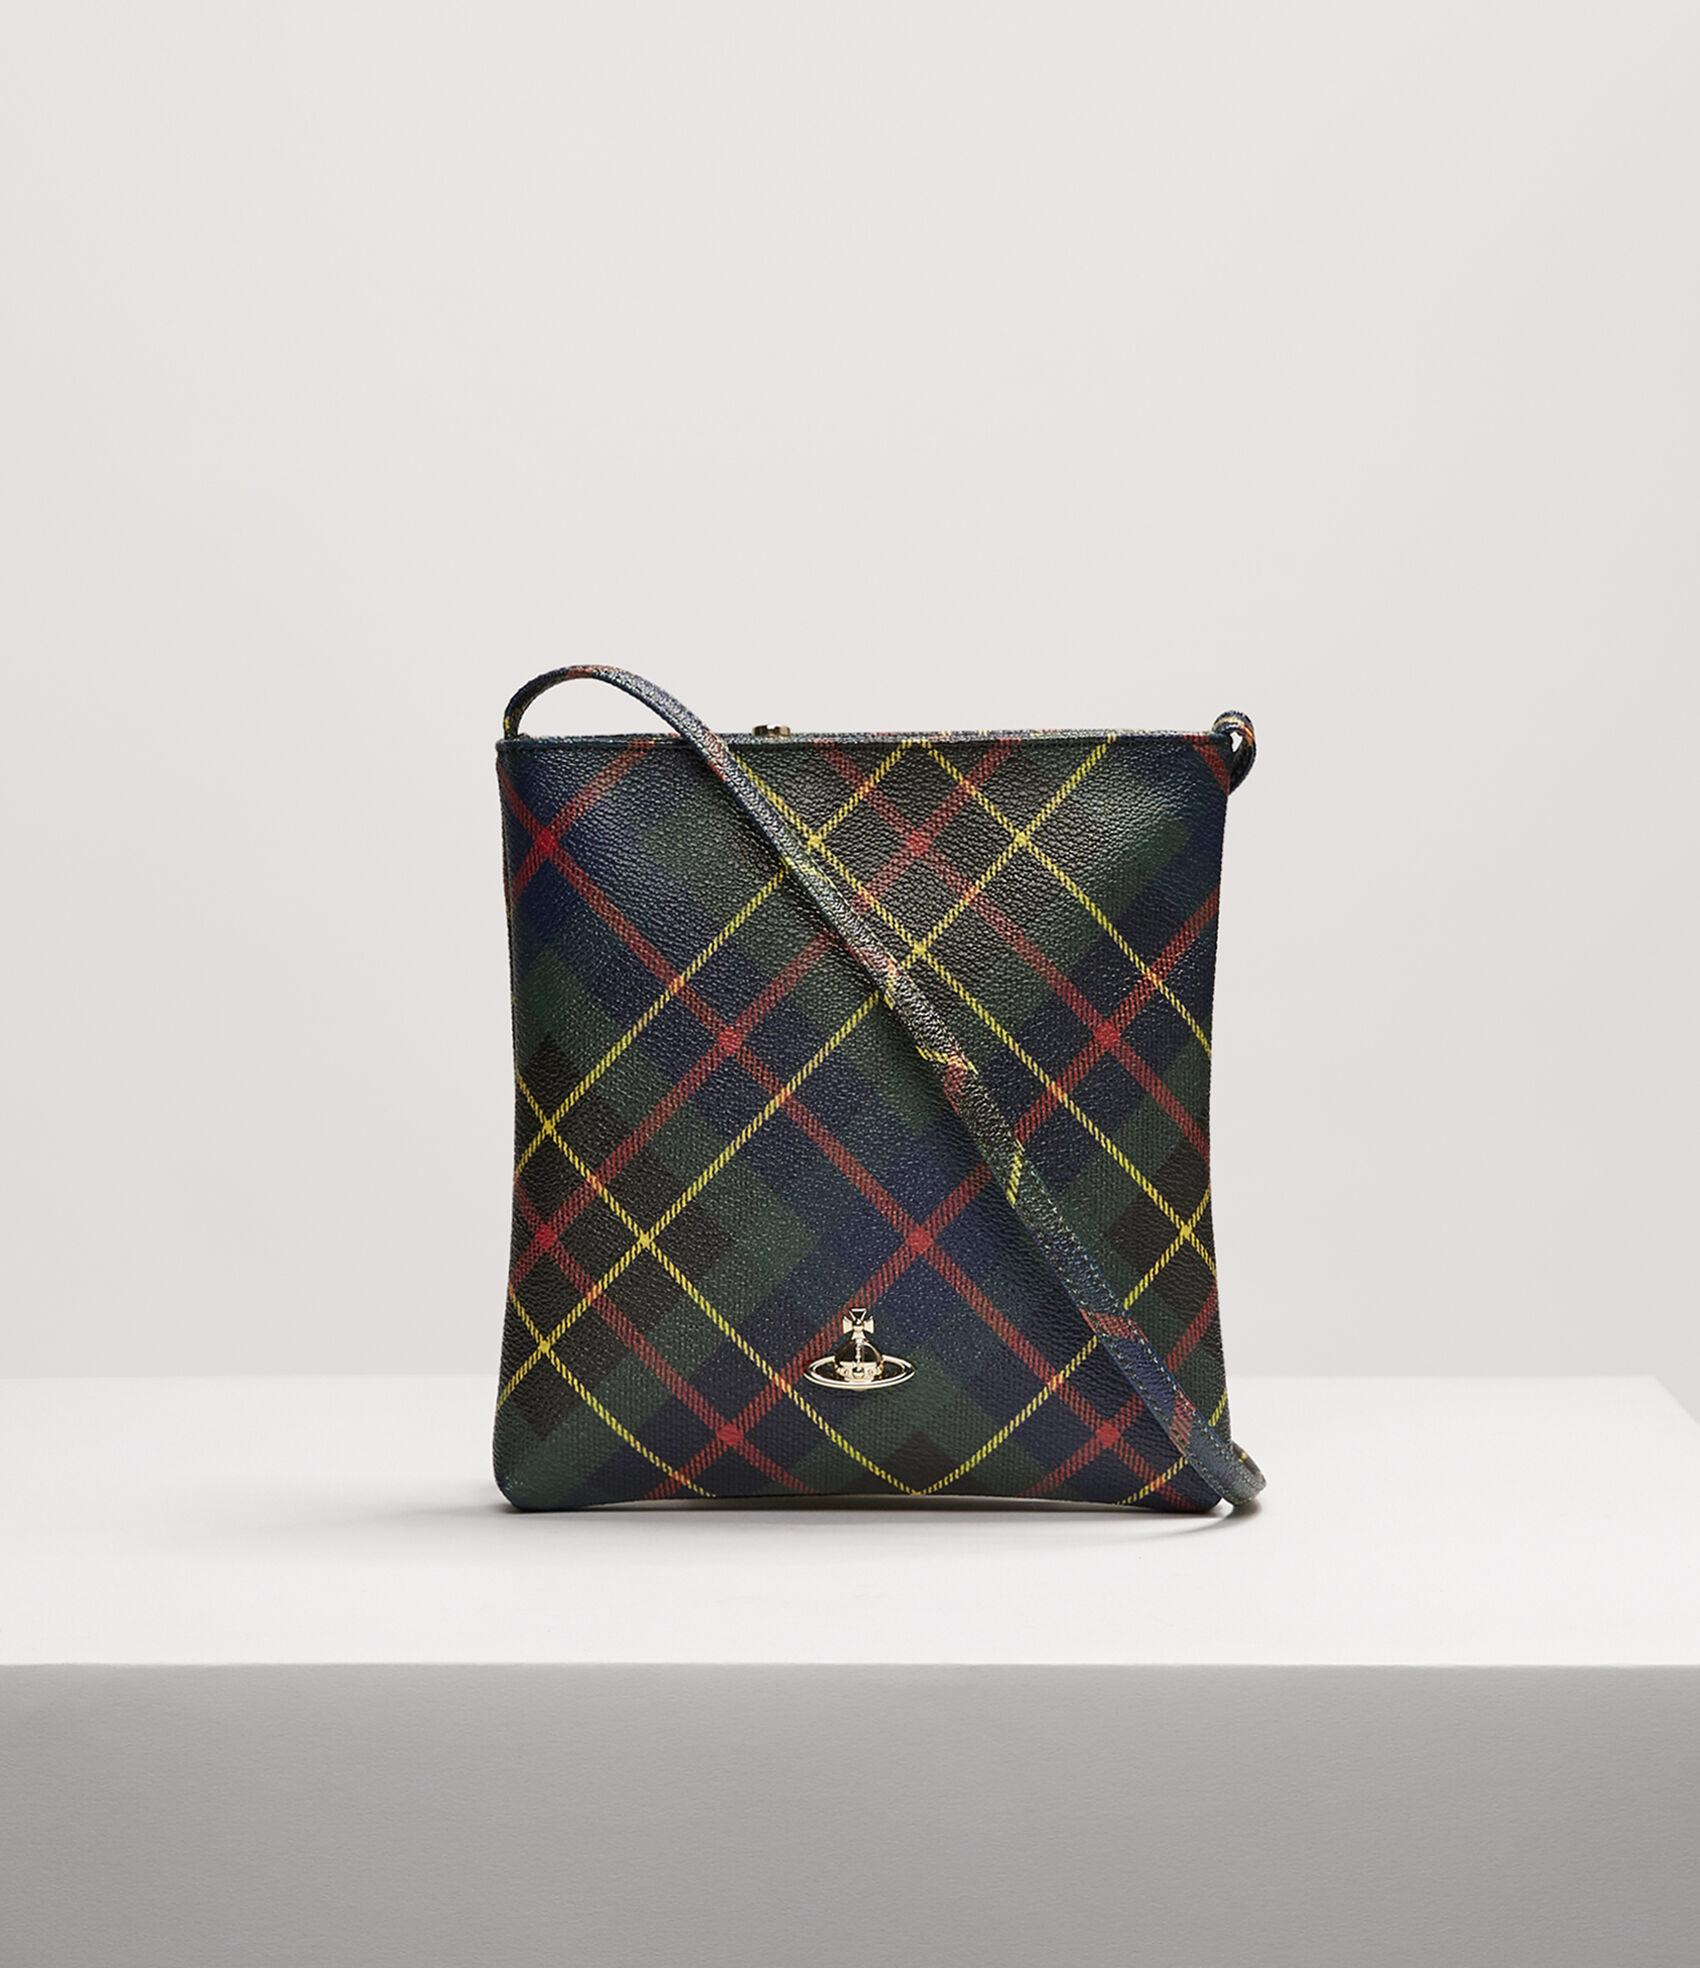 087271cdf230 Vivienne Westwood Women s Designer Crossbody Bags